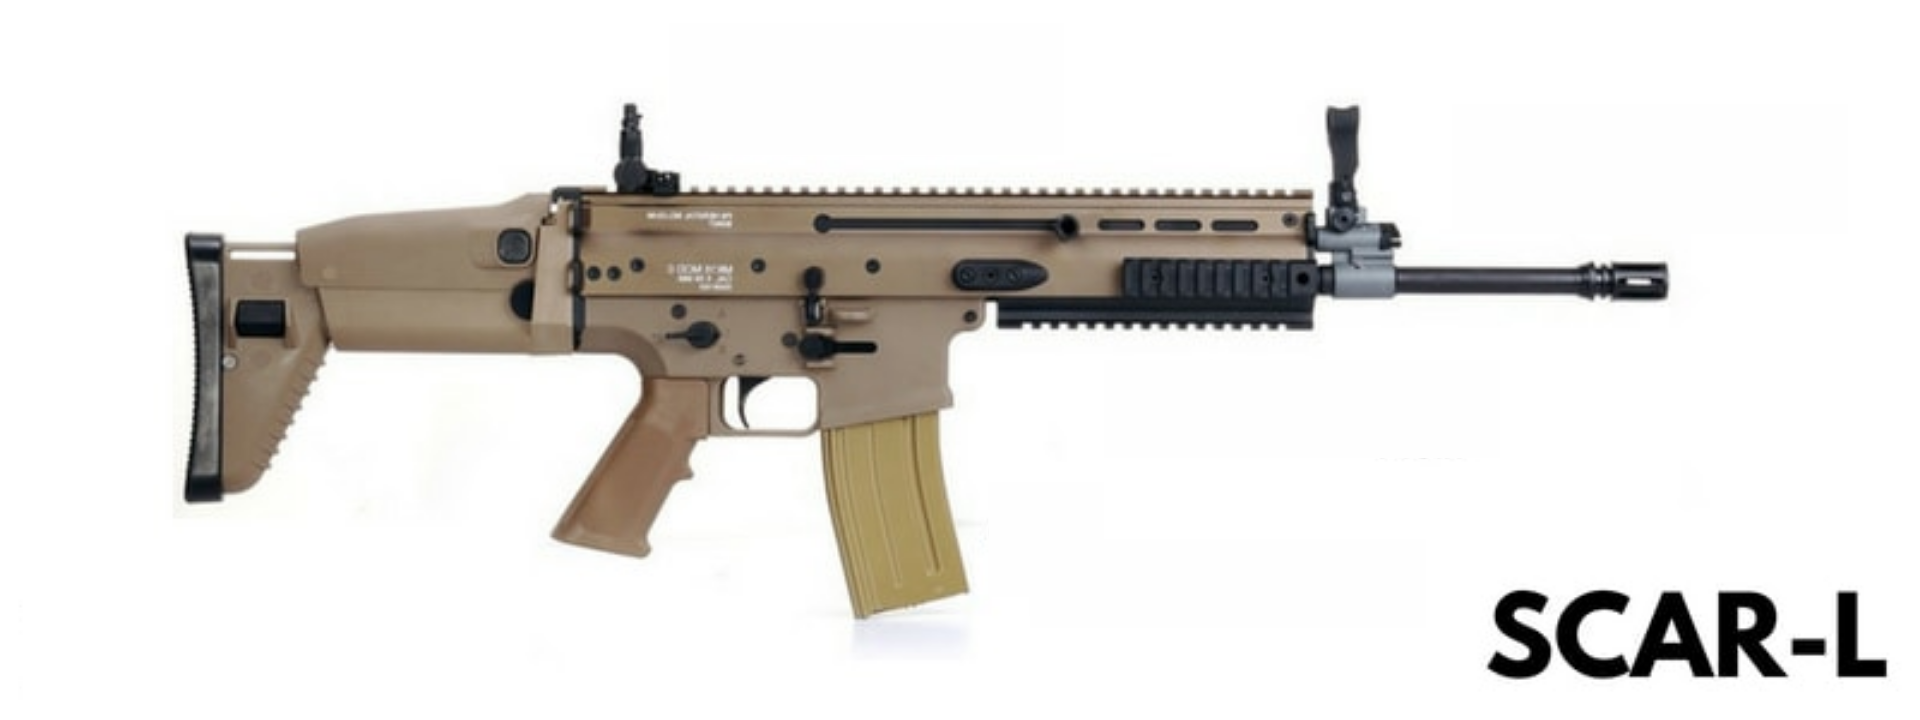 سلاح Scar-l في ببجي موبايل